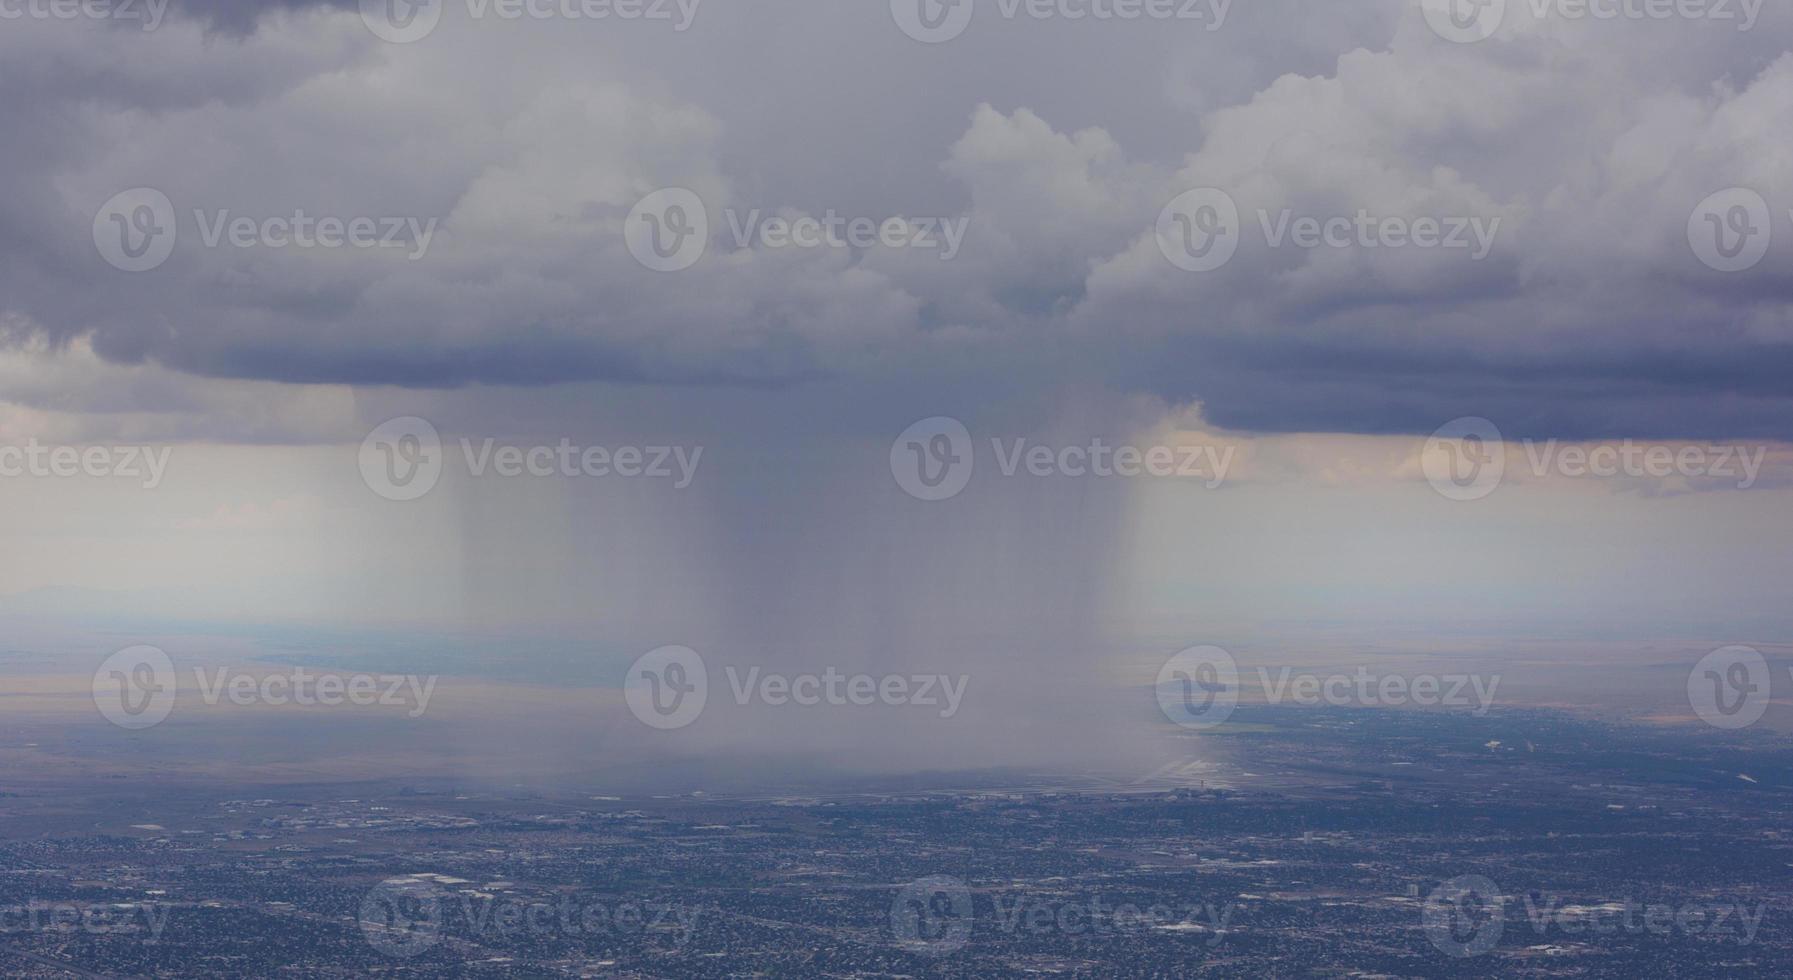 dramatisk regnstorm över albuquerque flygplats foto